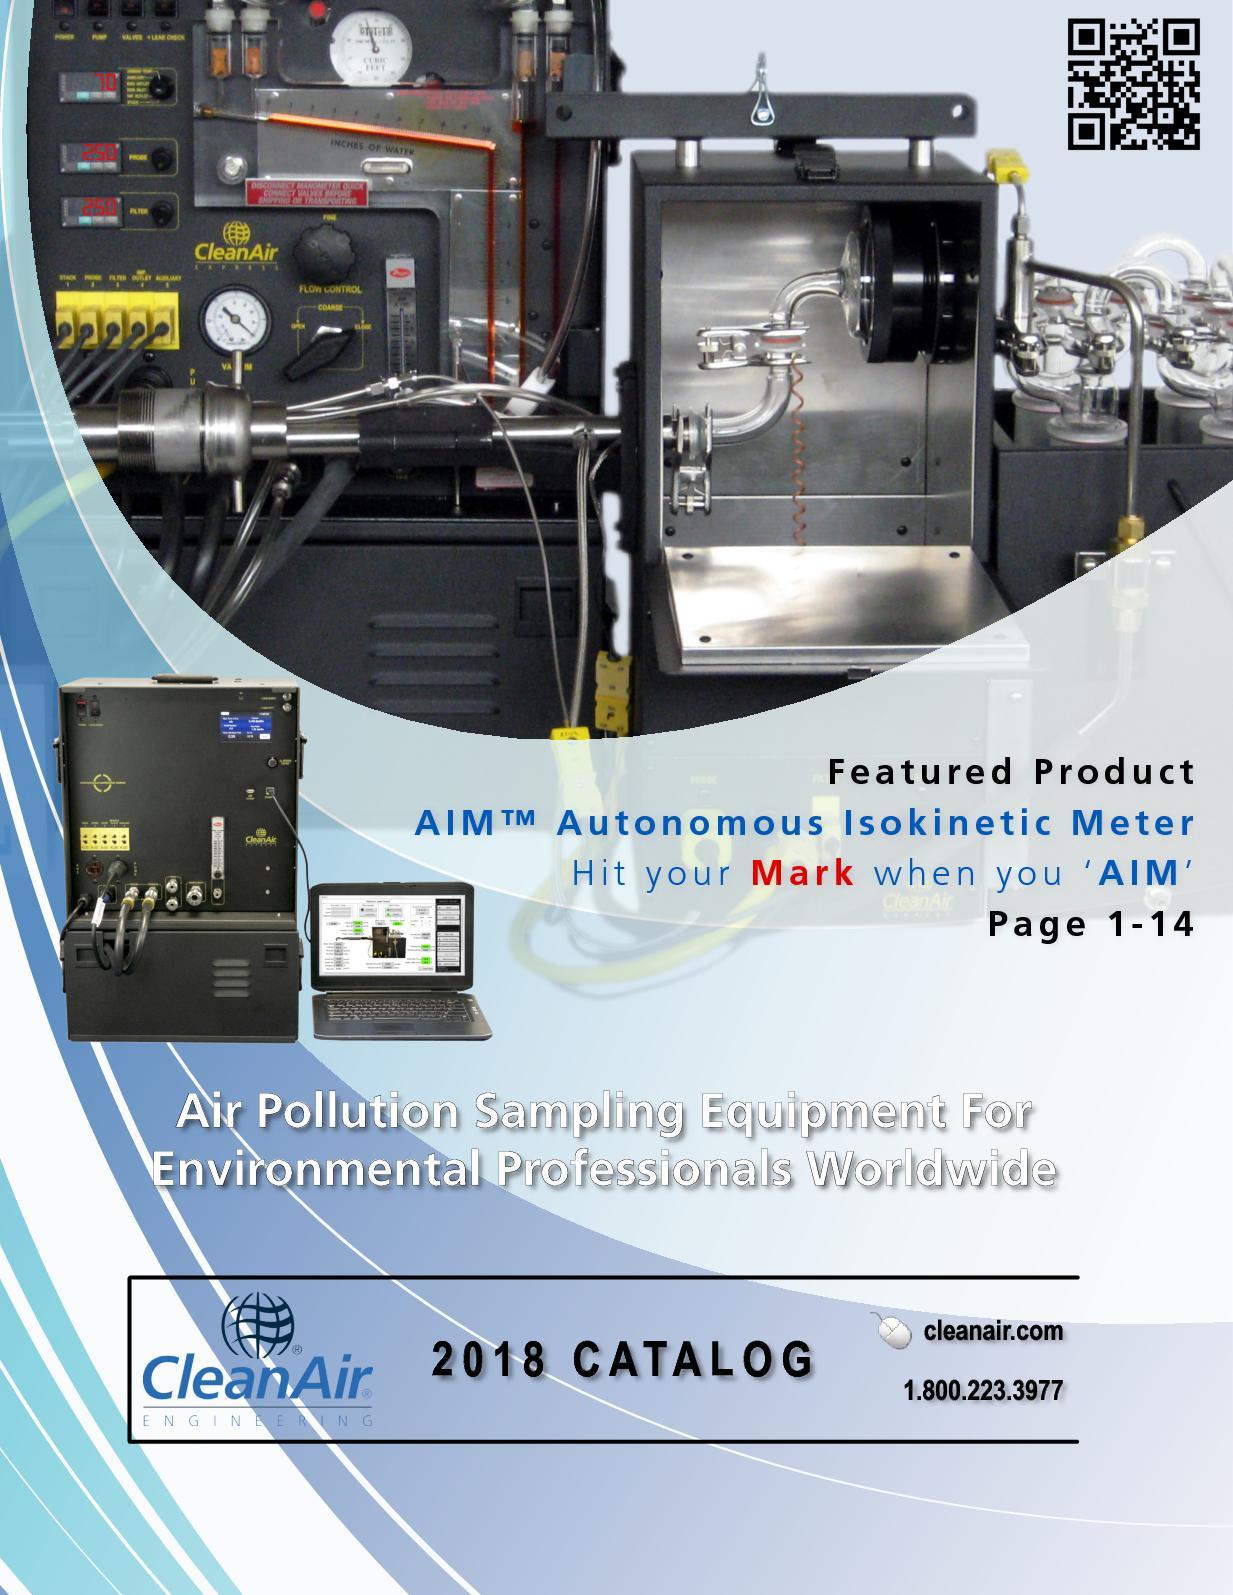 Calamo Clean Air Engineering Catalog Circuit Breaker 2 Pole 25a 230v 50 60hz For Gas Diesel Generator